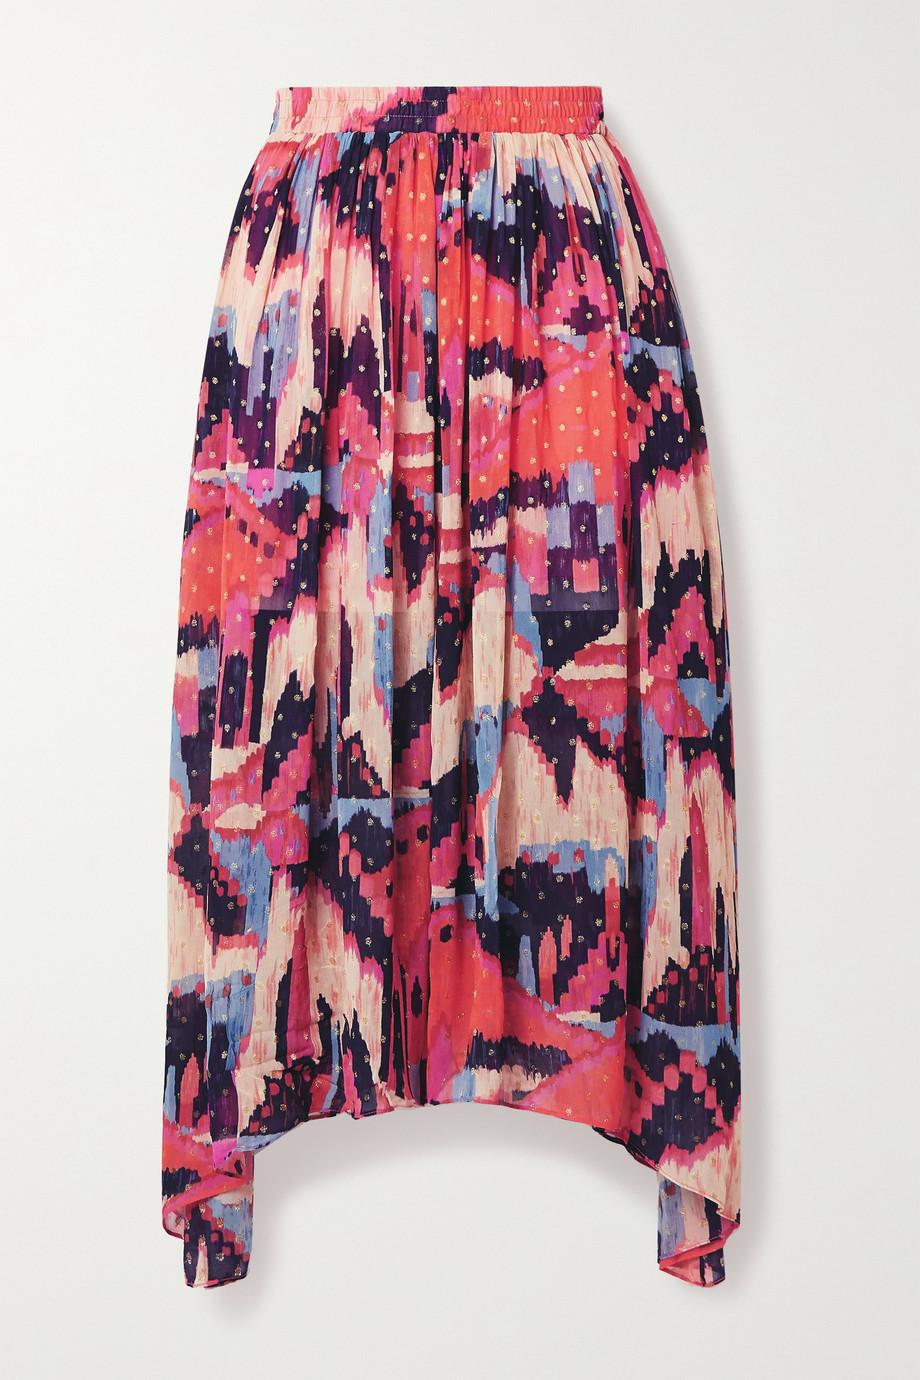 Chufy Urpi asymmetric printed fil coupé georgette midi skirt